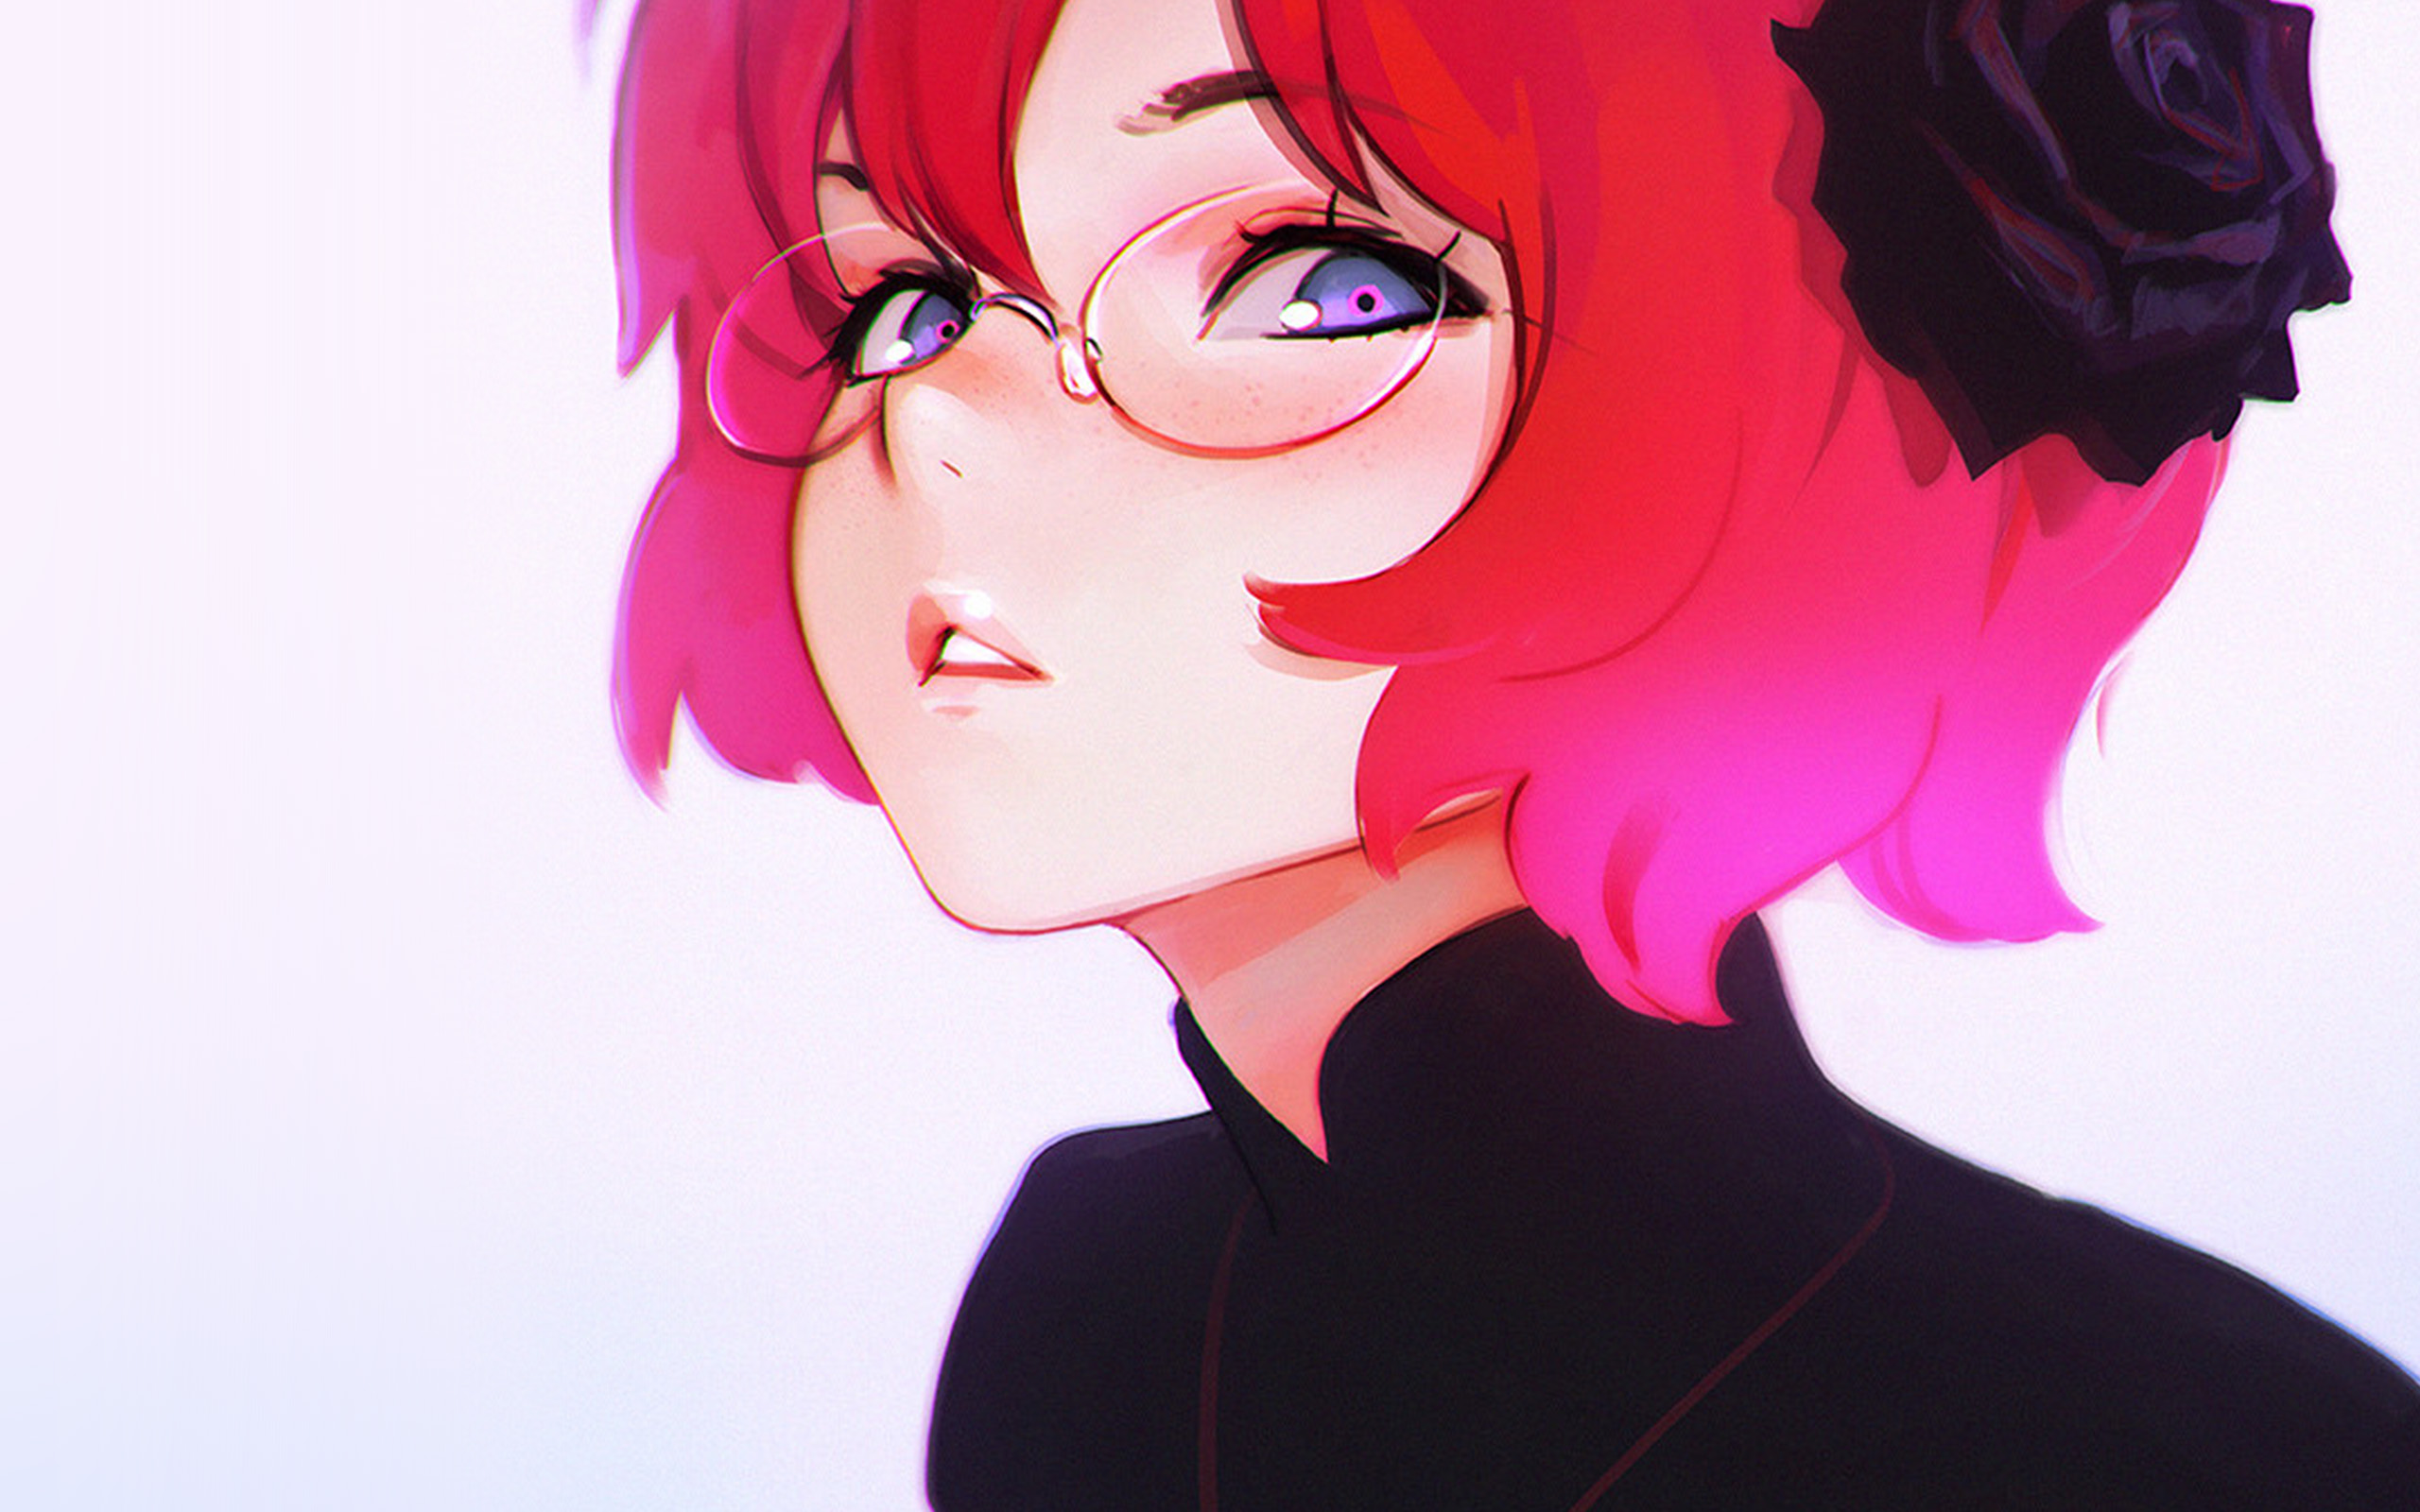 Anime Girl With Short Dark Blue Hair